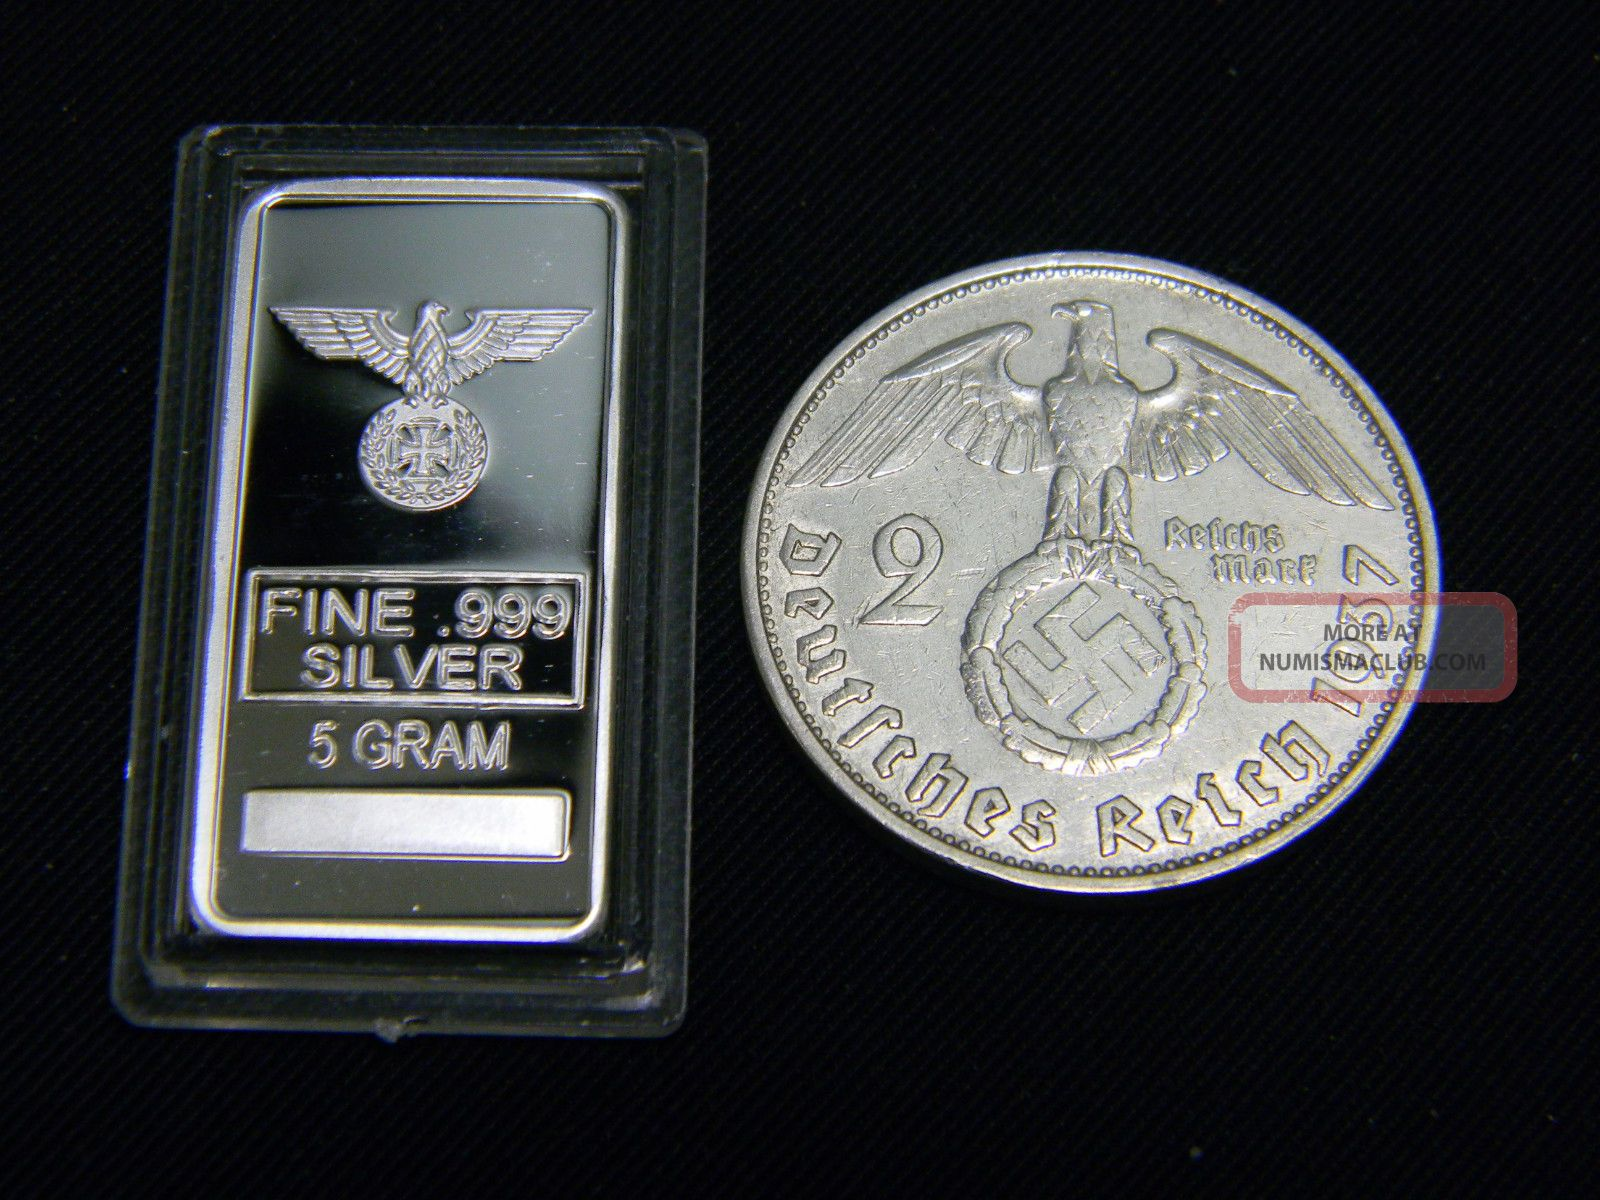 Nazi German Swastika 2 Mark Silver Coin Amp 5 Gram 999 Iron